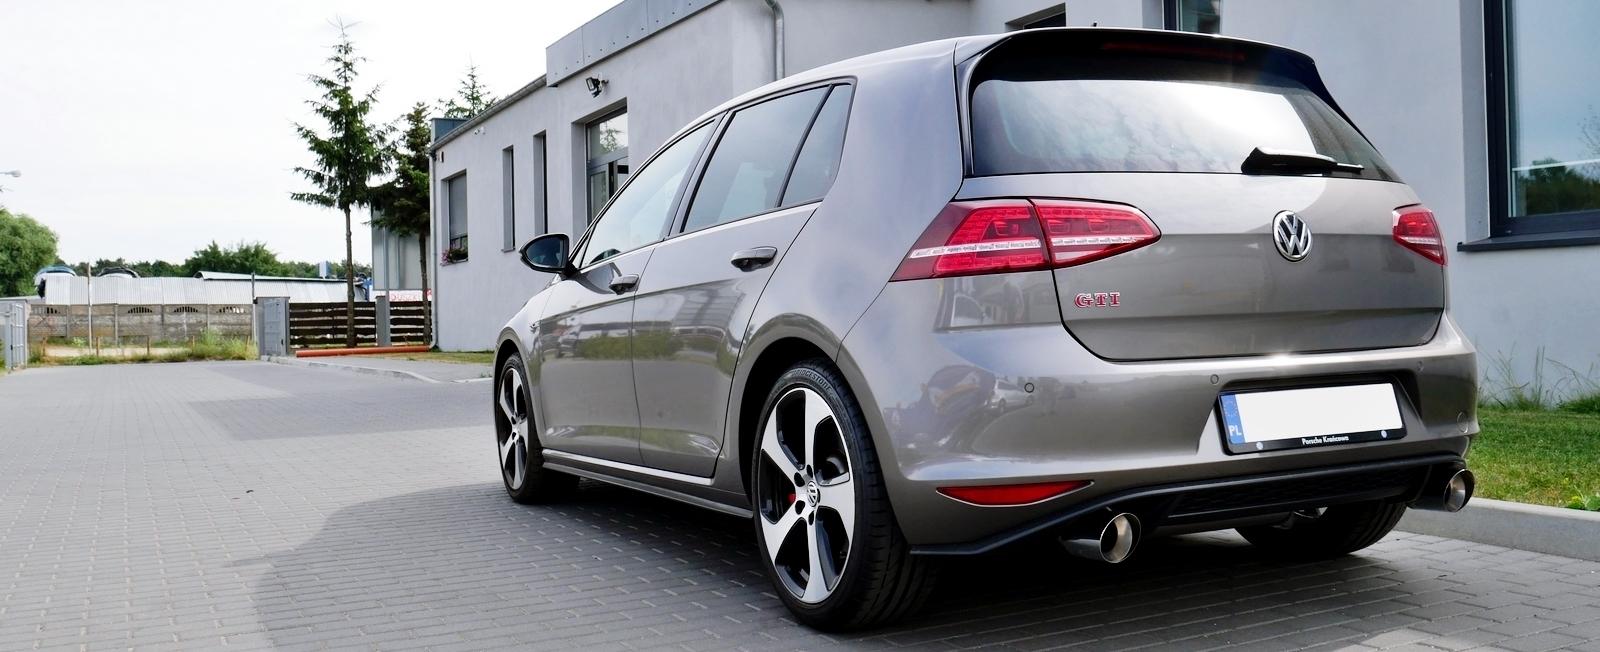 VW Golf 7 GTI Remus